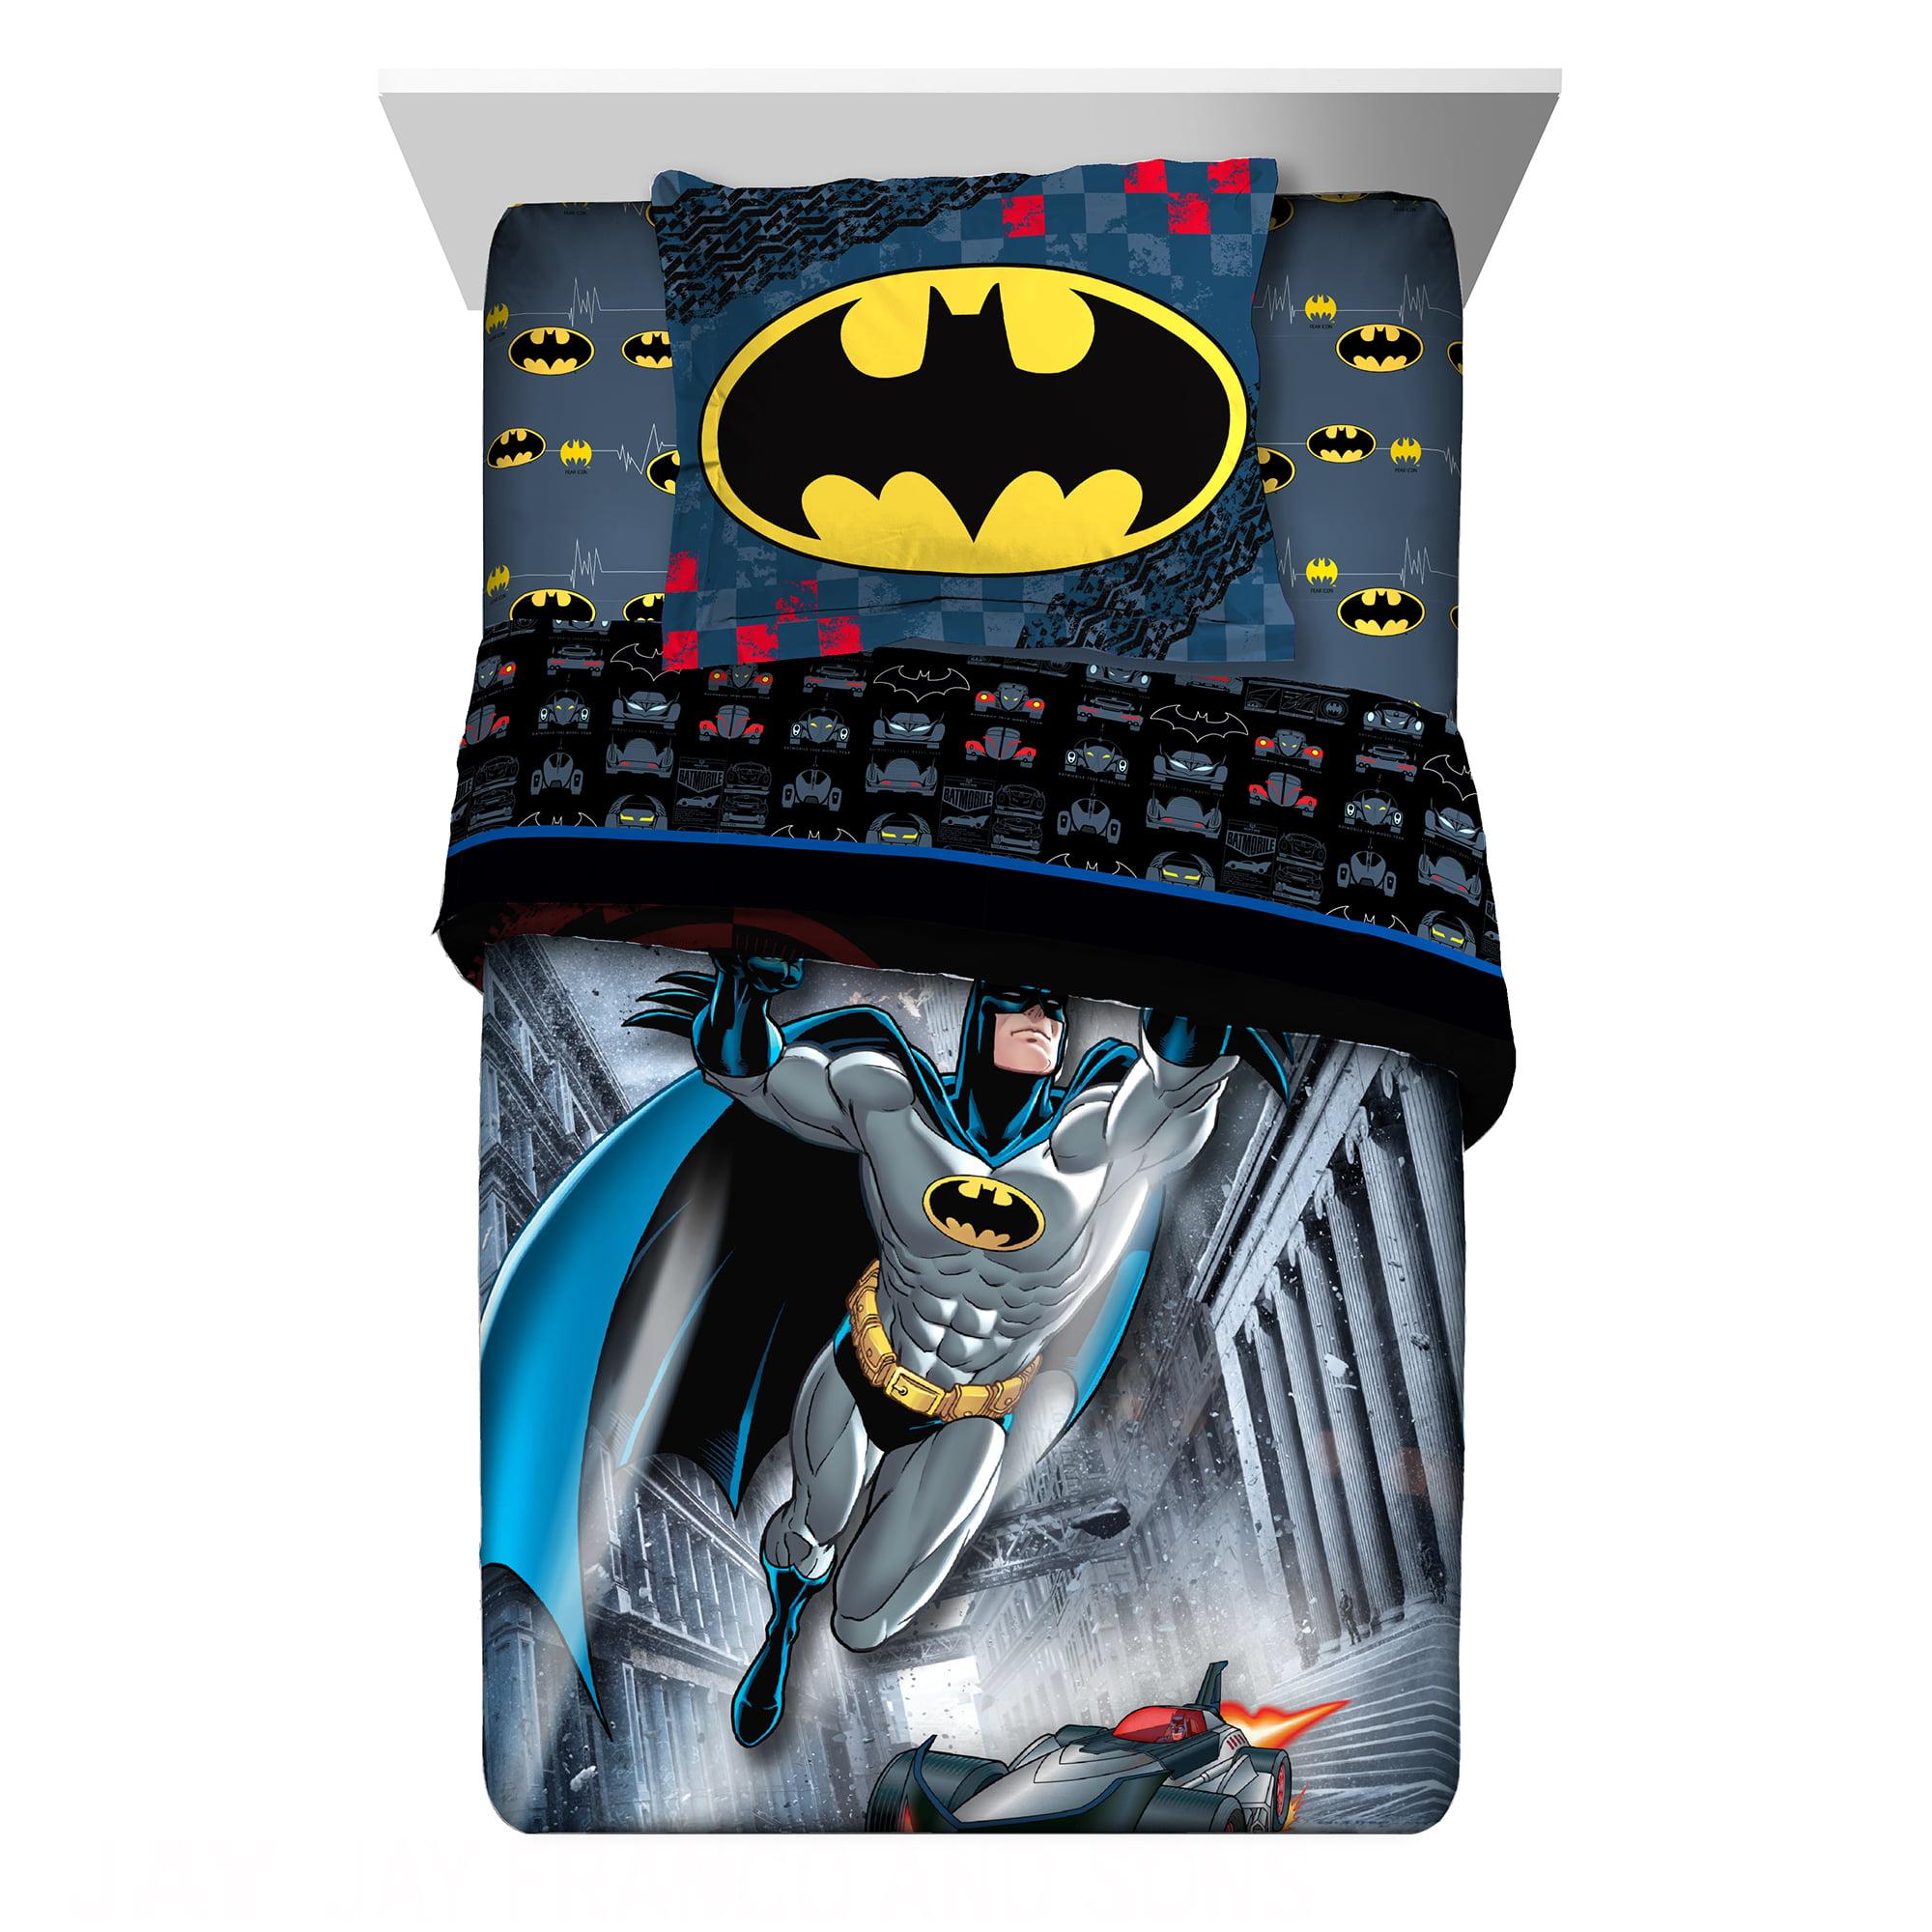 DC Comics Batman Guardian Speed Twin & Full Comforter and Sham Set, 2 Piece